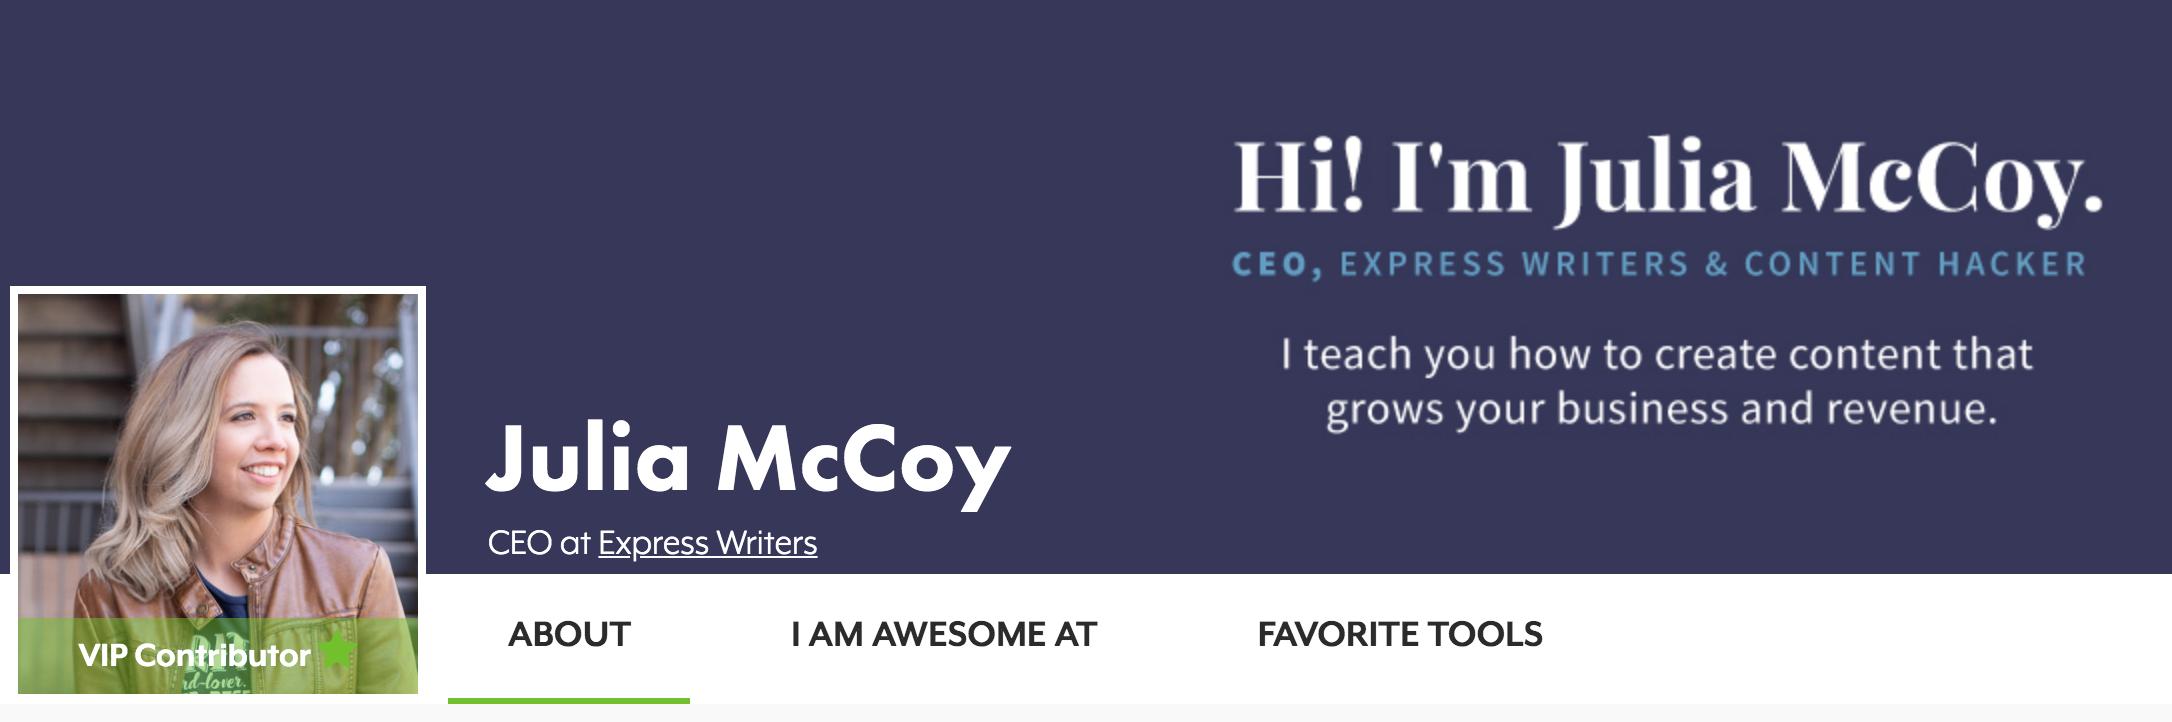 Search Engine Journal Contributor Julia McCoy